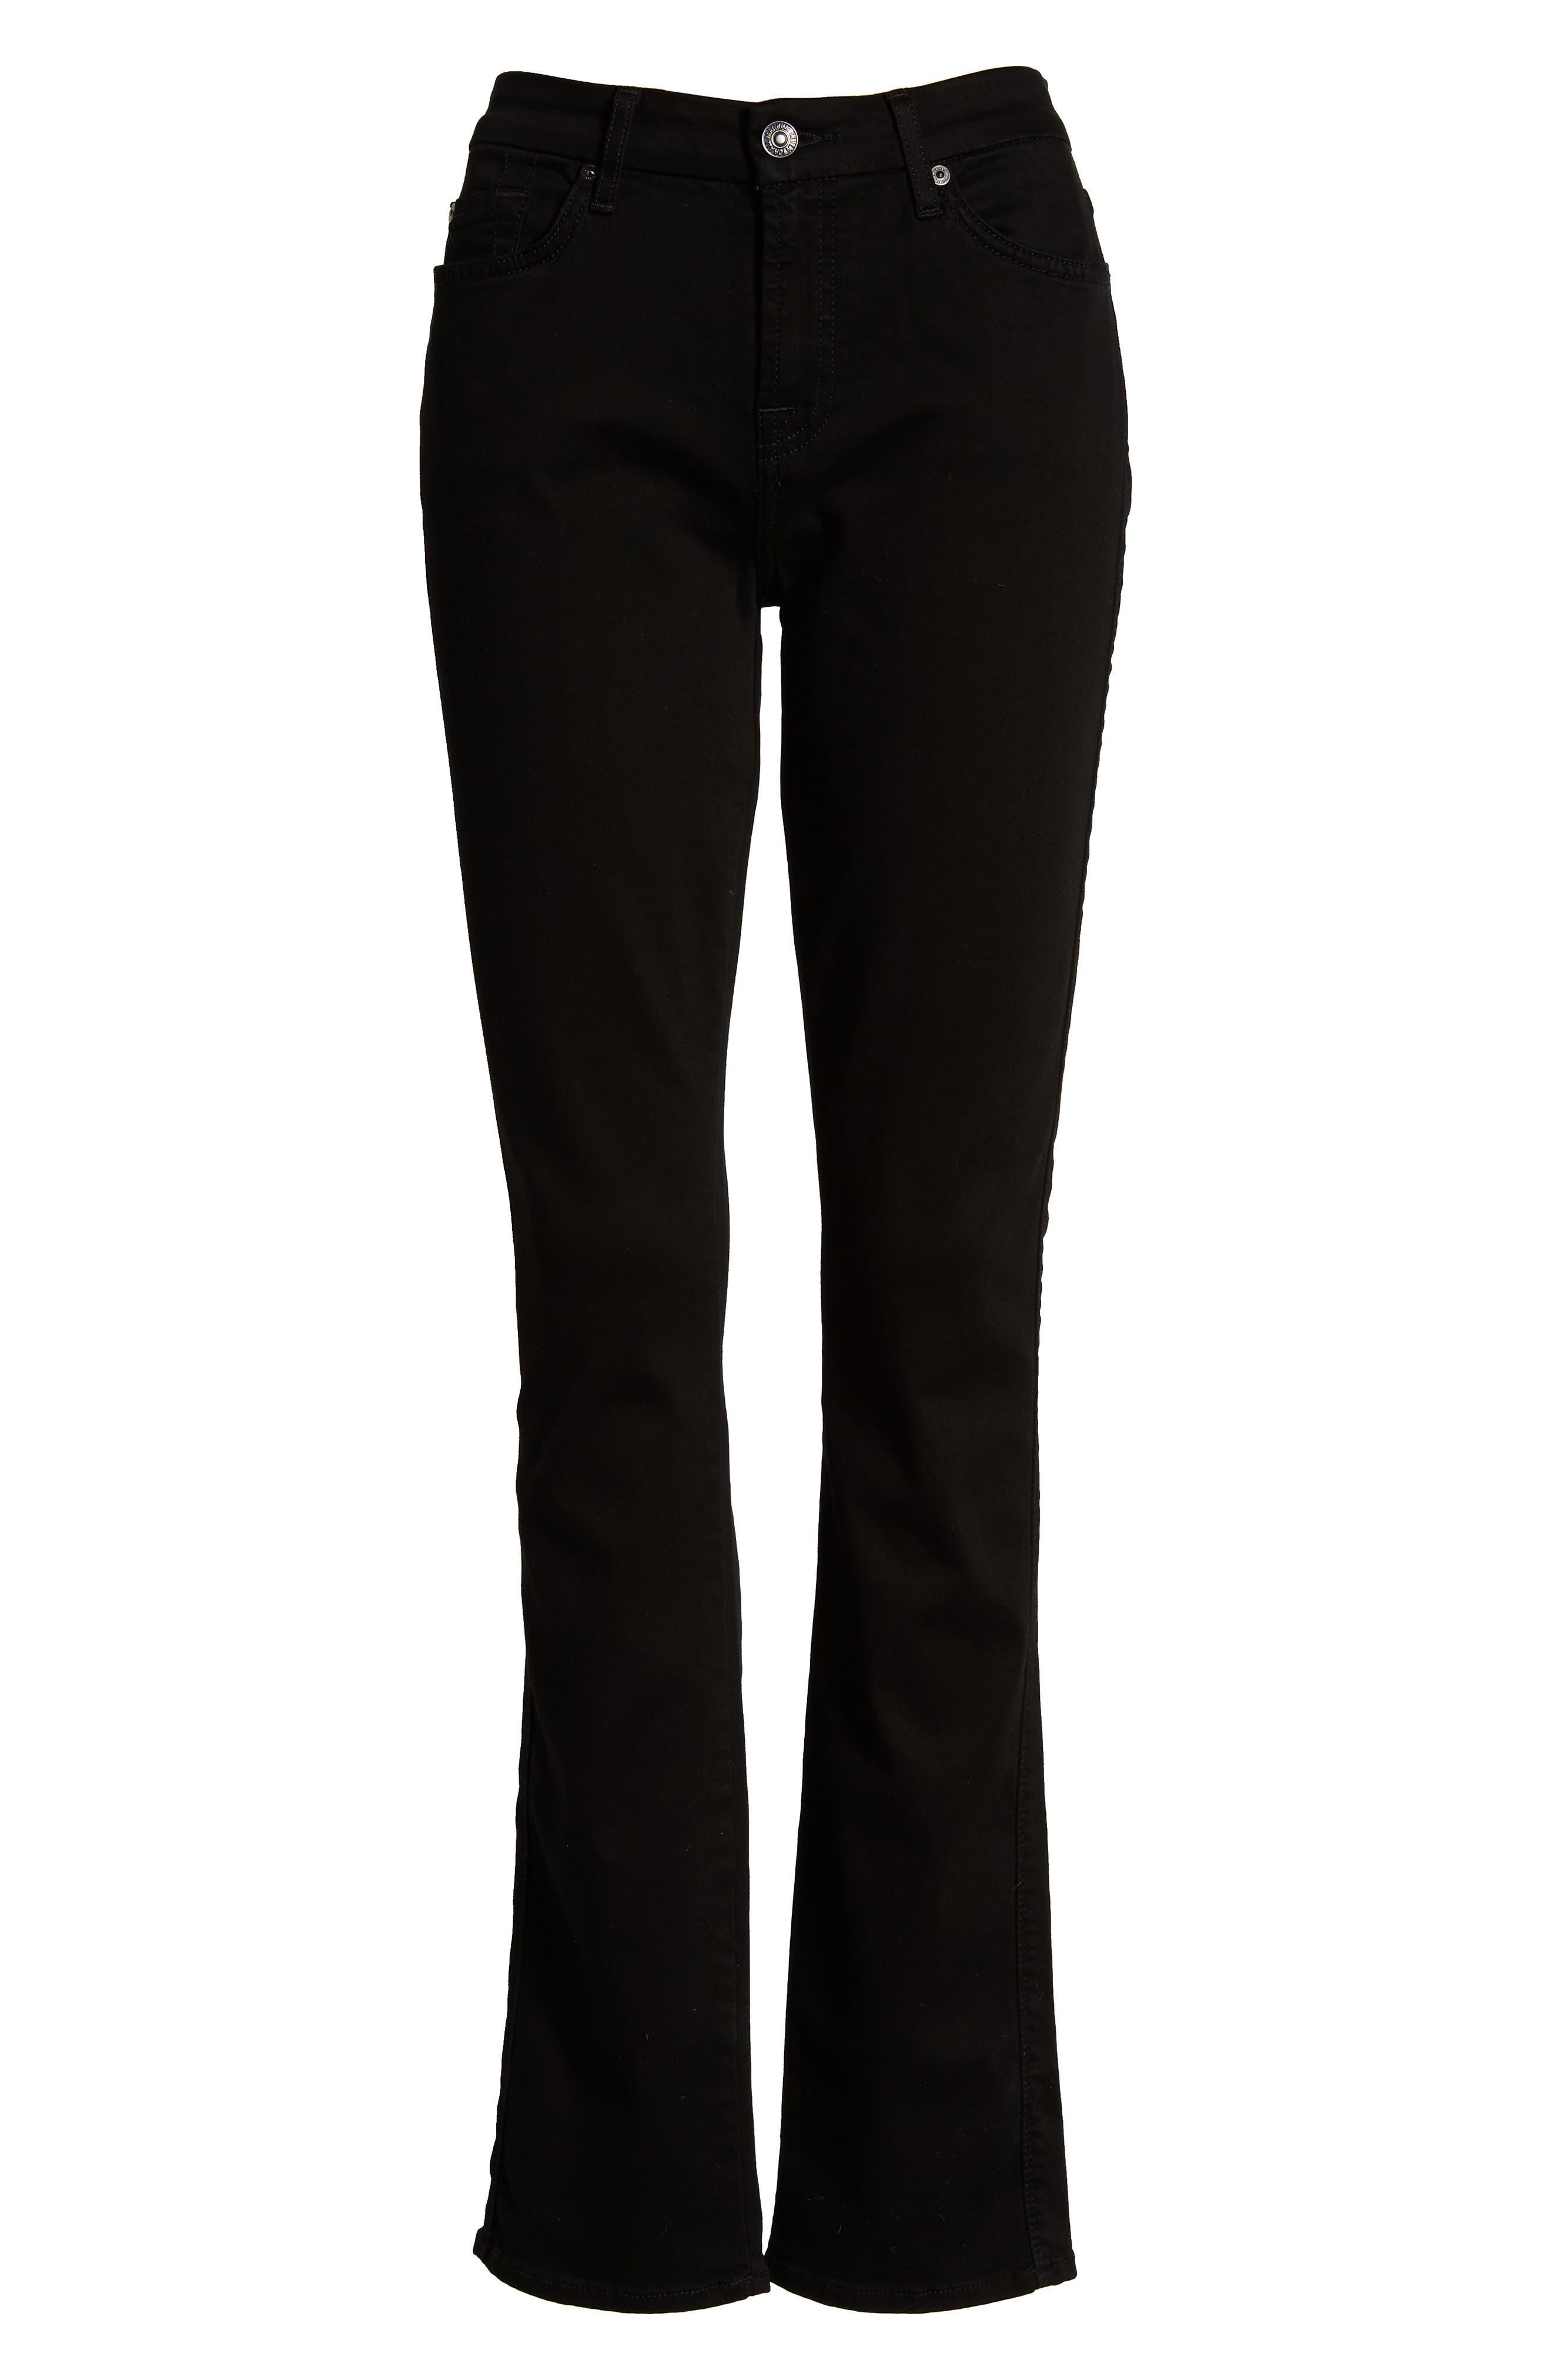 7 FOR ALL MANKIND<SUP>®</SUP>,                             'b(air) - Kimmie' Straight Leg Jeans,                             Alternate thumbnail 2, color,                             BAIR BLACK